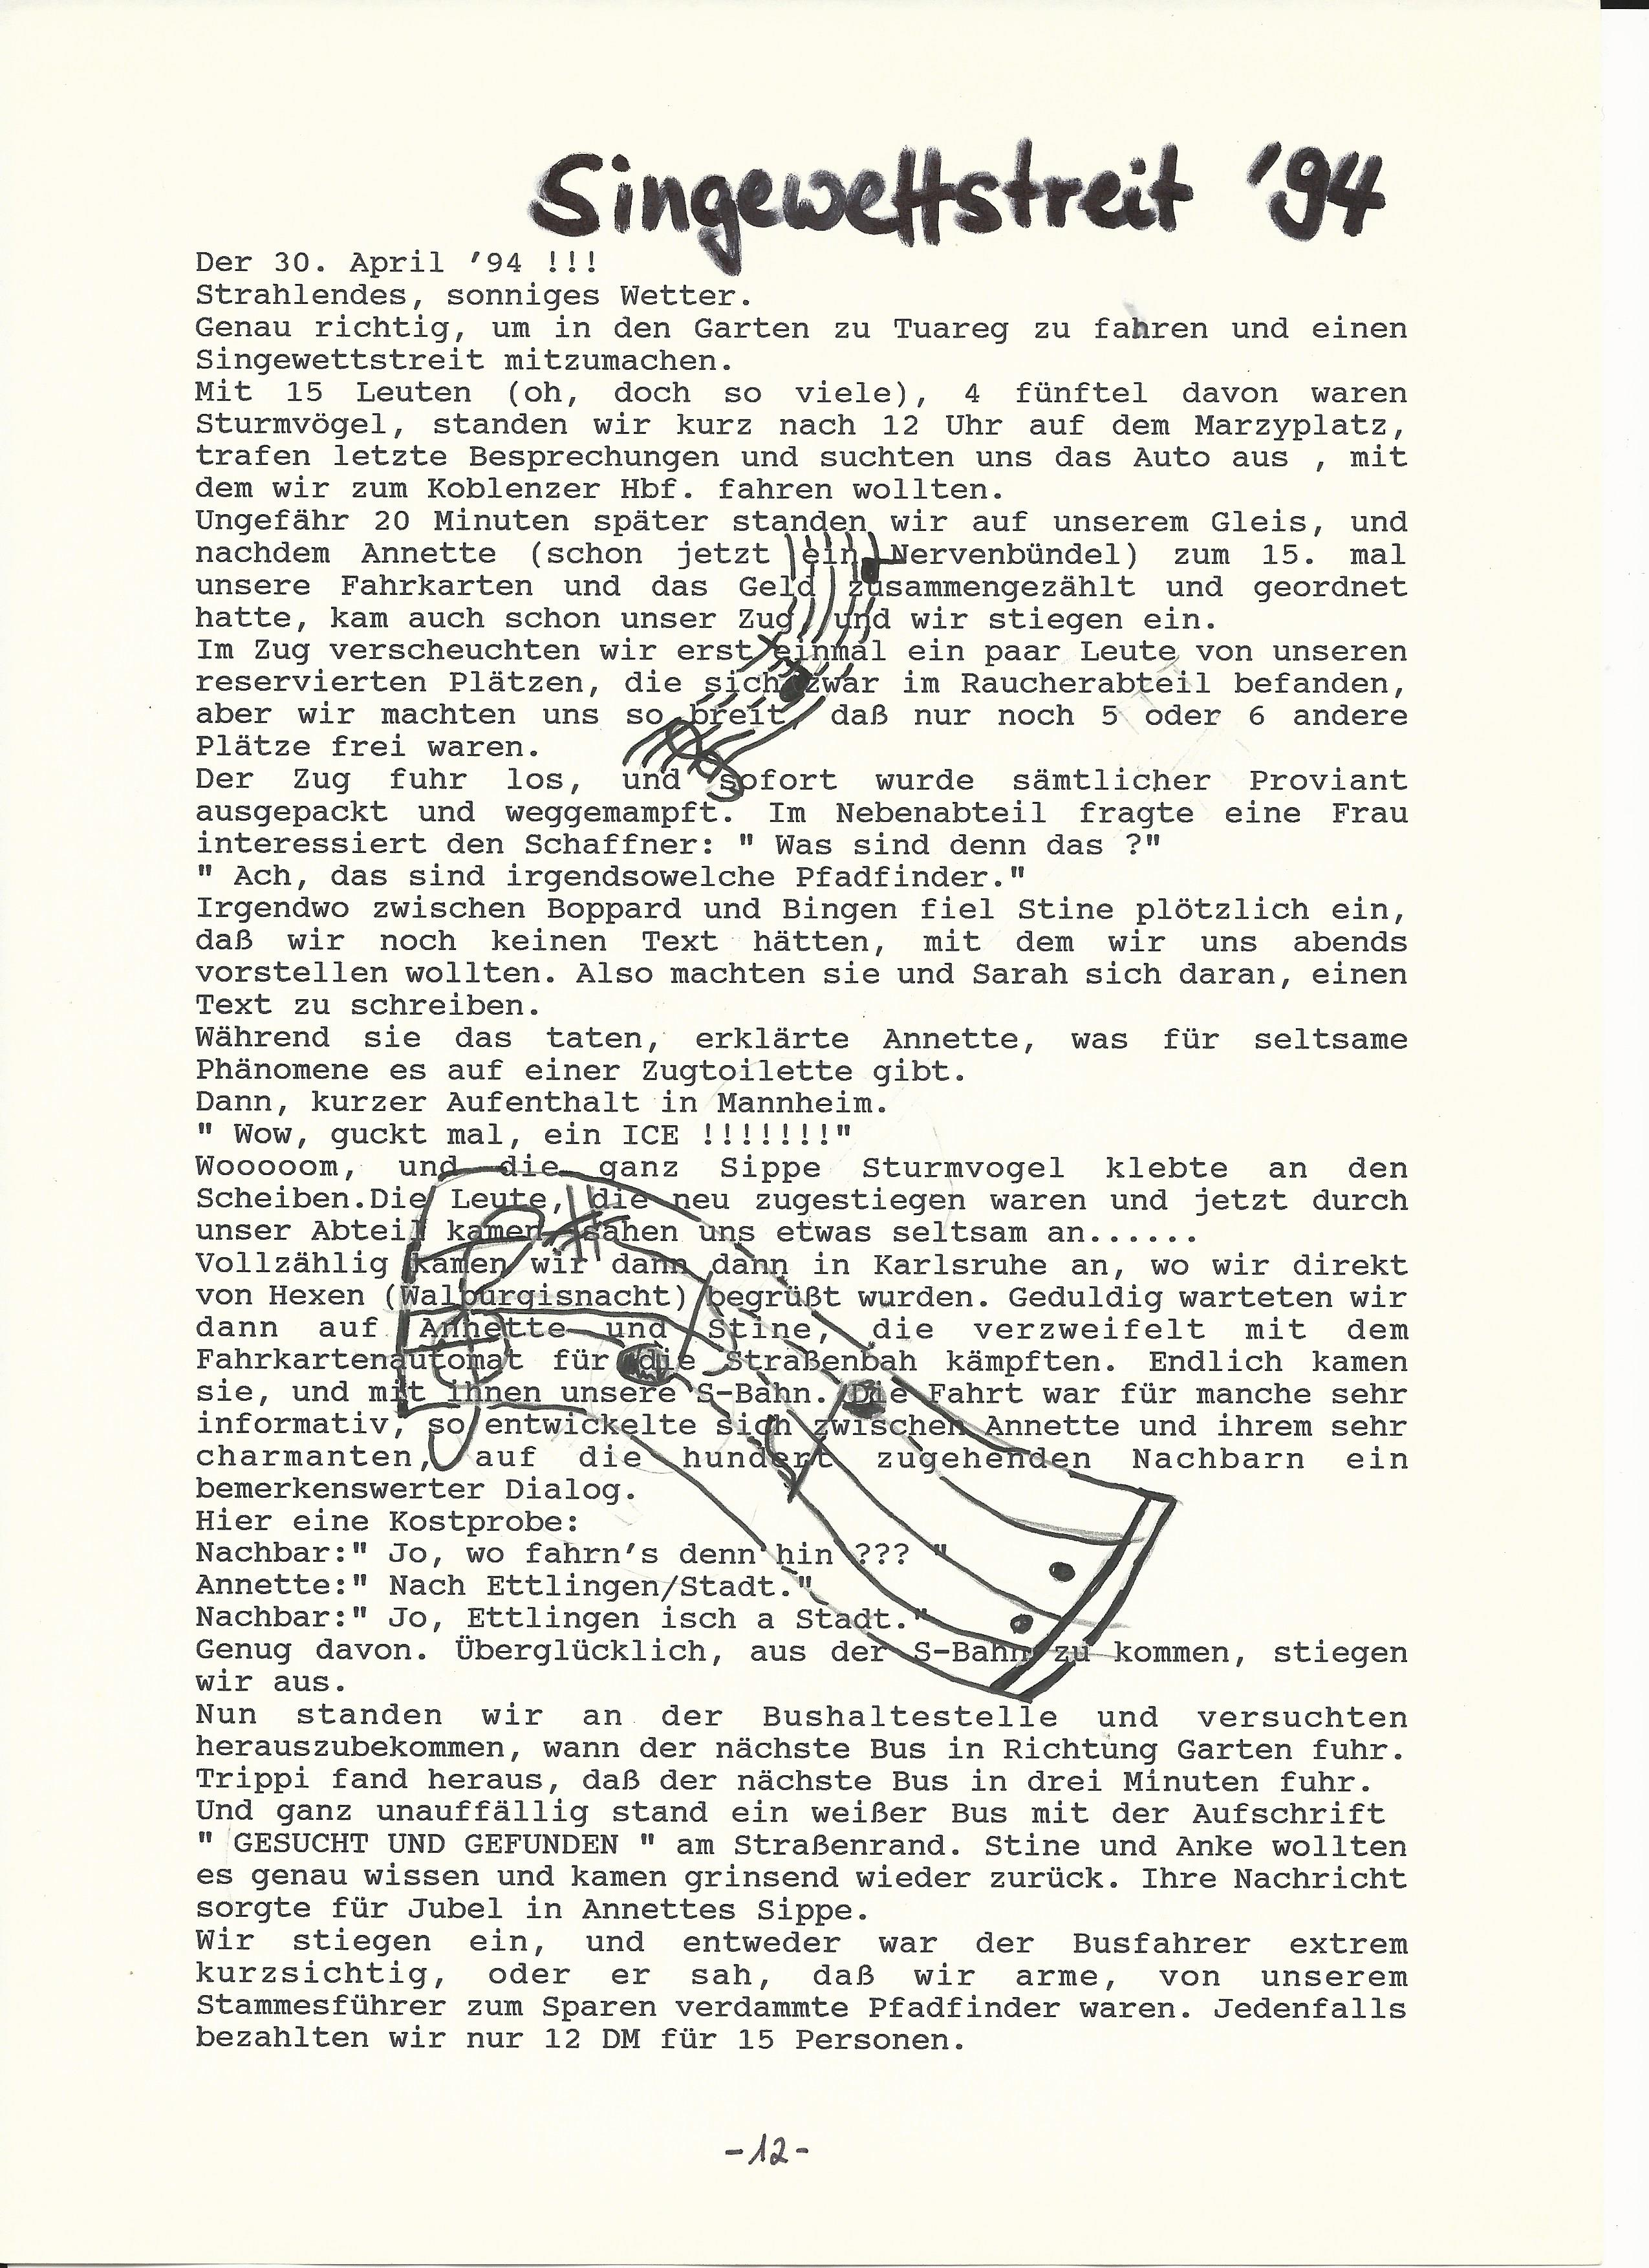 1994 - Singewettstreit0002